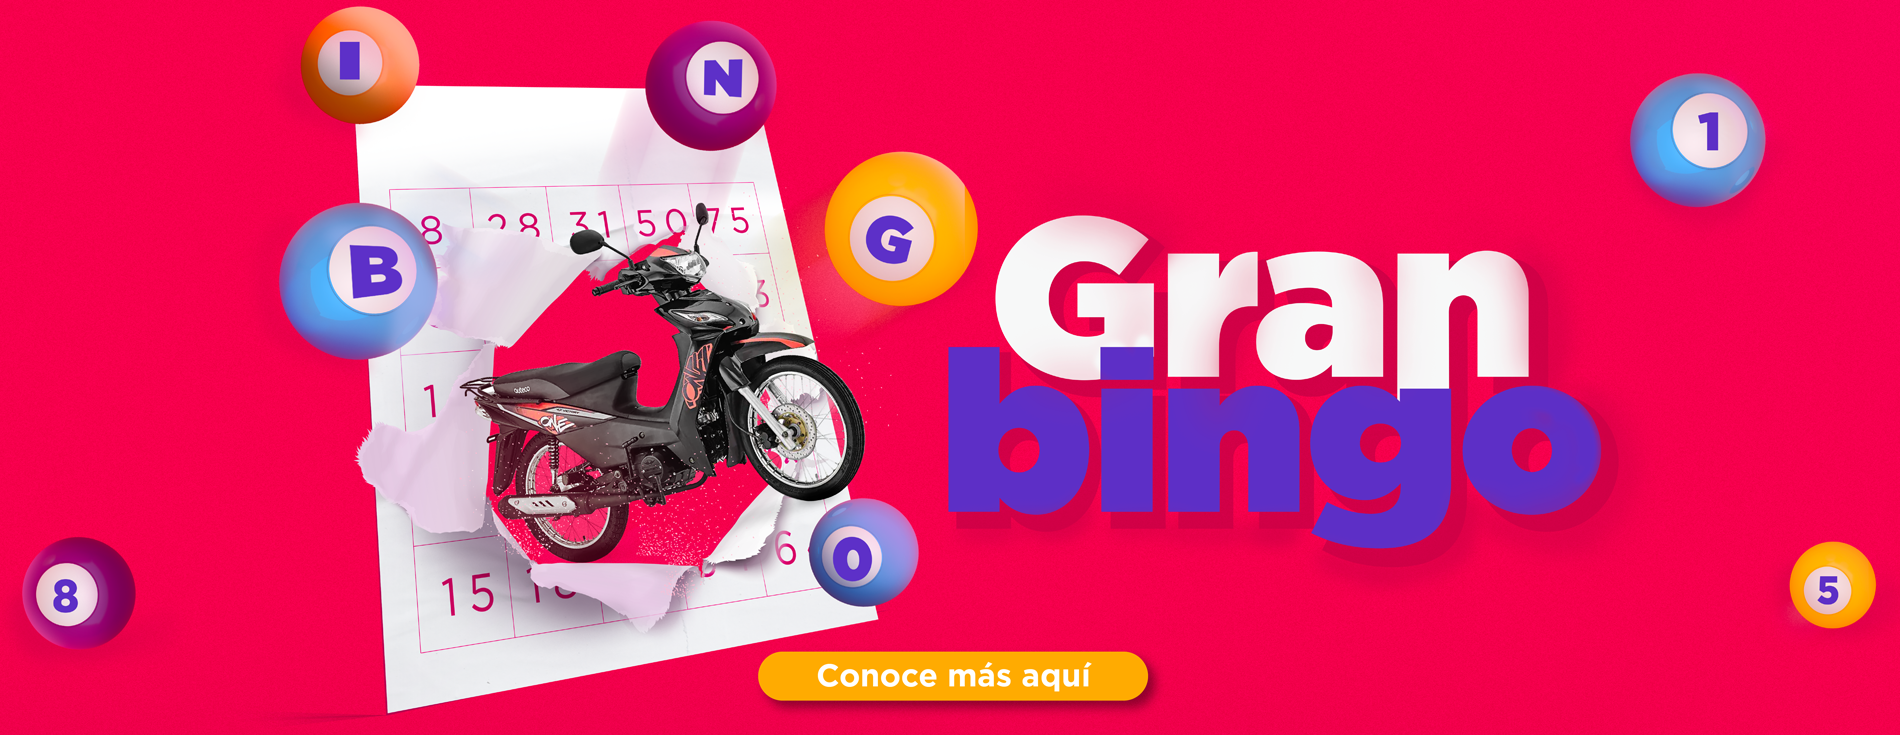 Gran Bingo - Wajiira